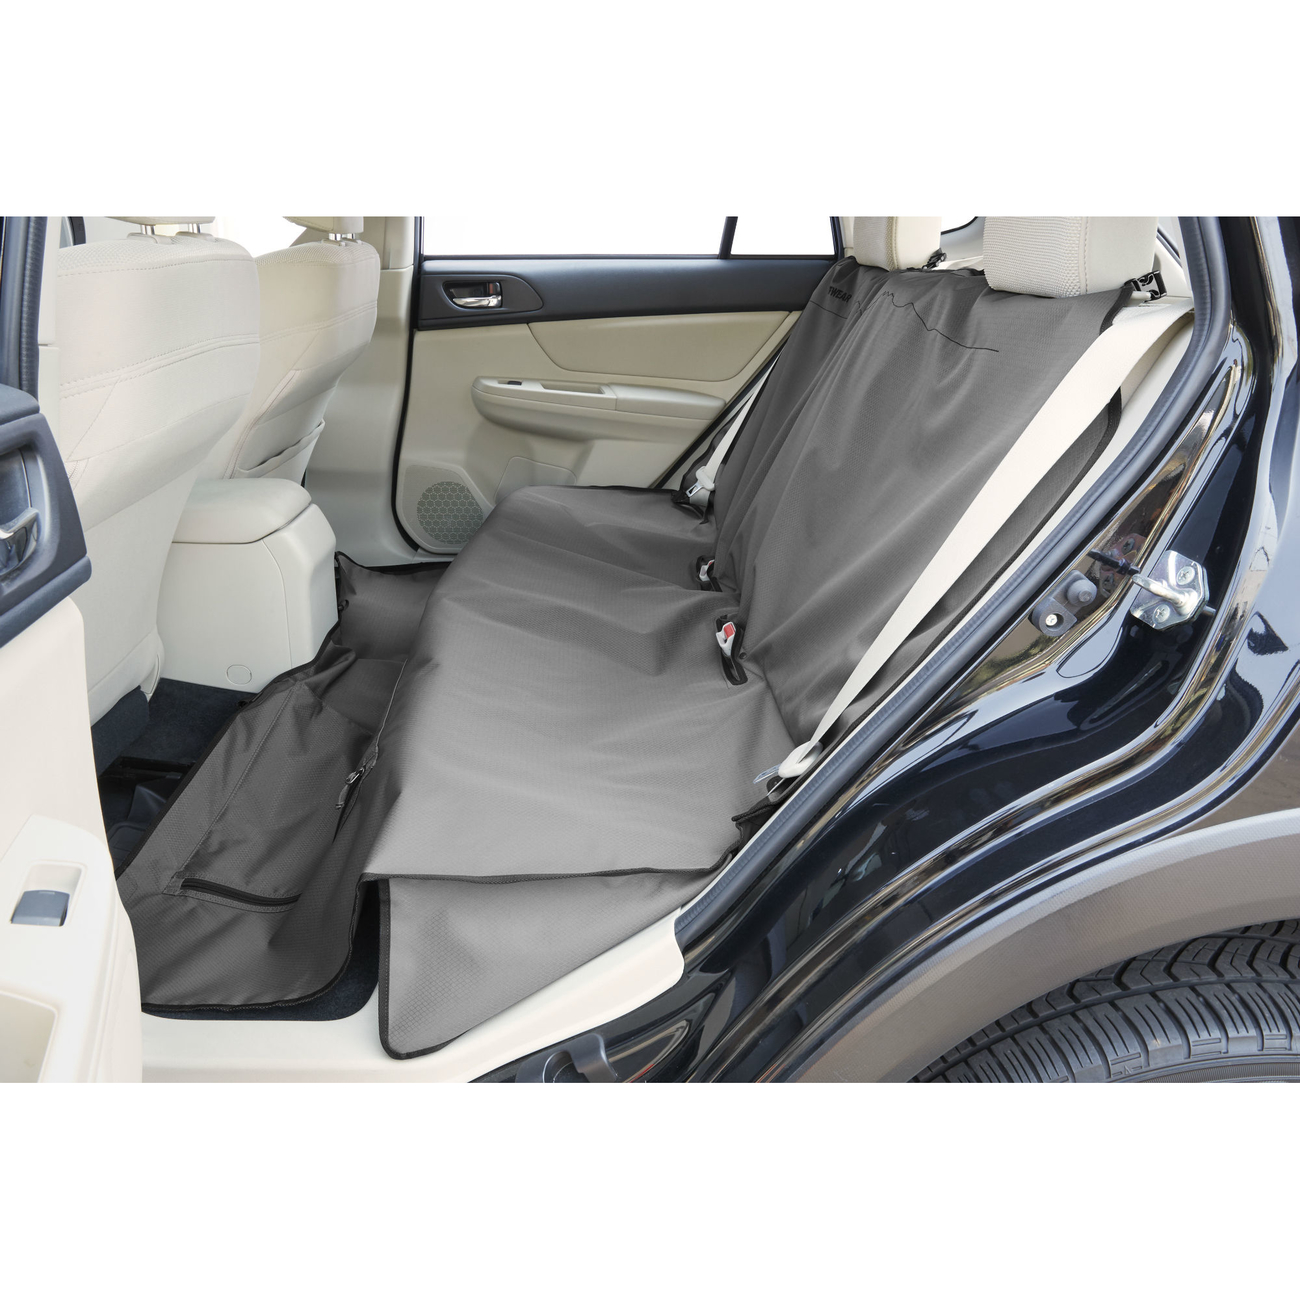 Ruffwear Dirtbag Seat Cover Autoschutzdecke, Bild 3